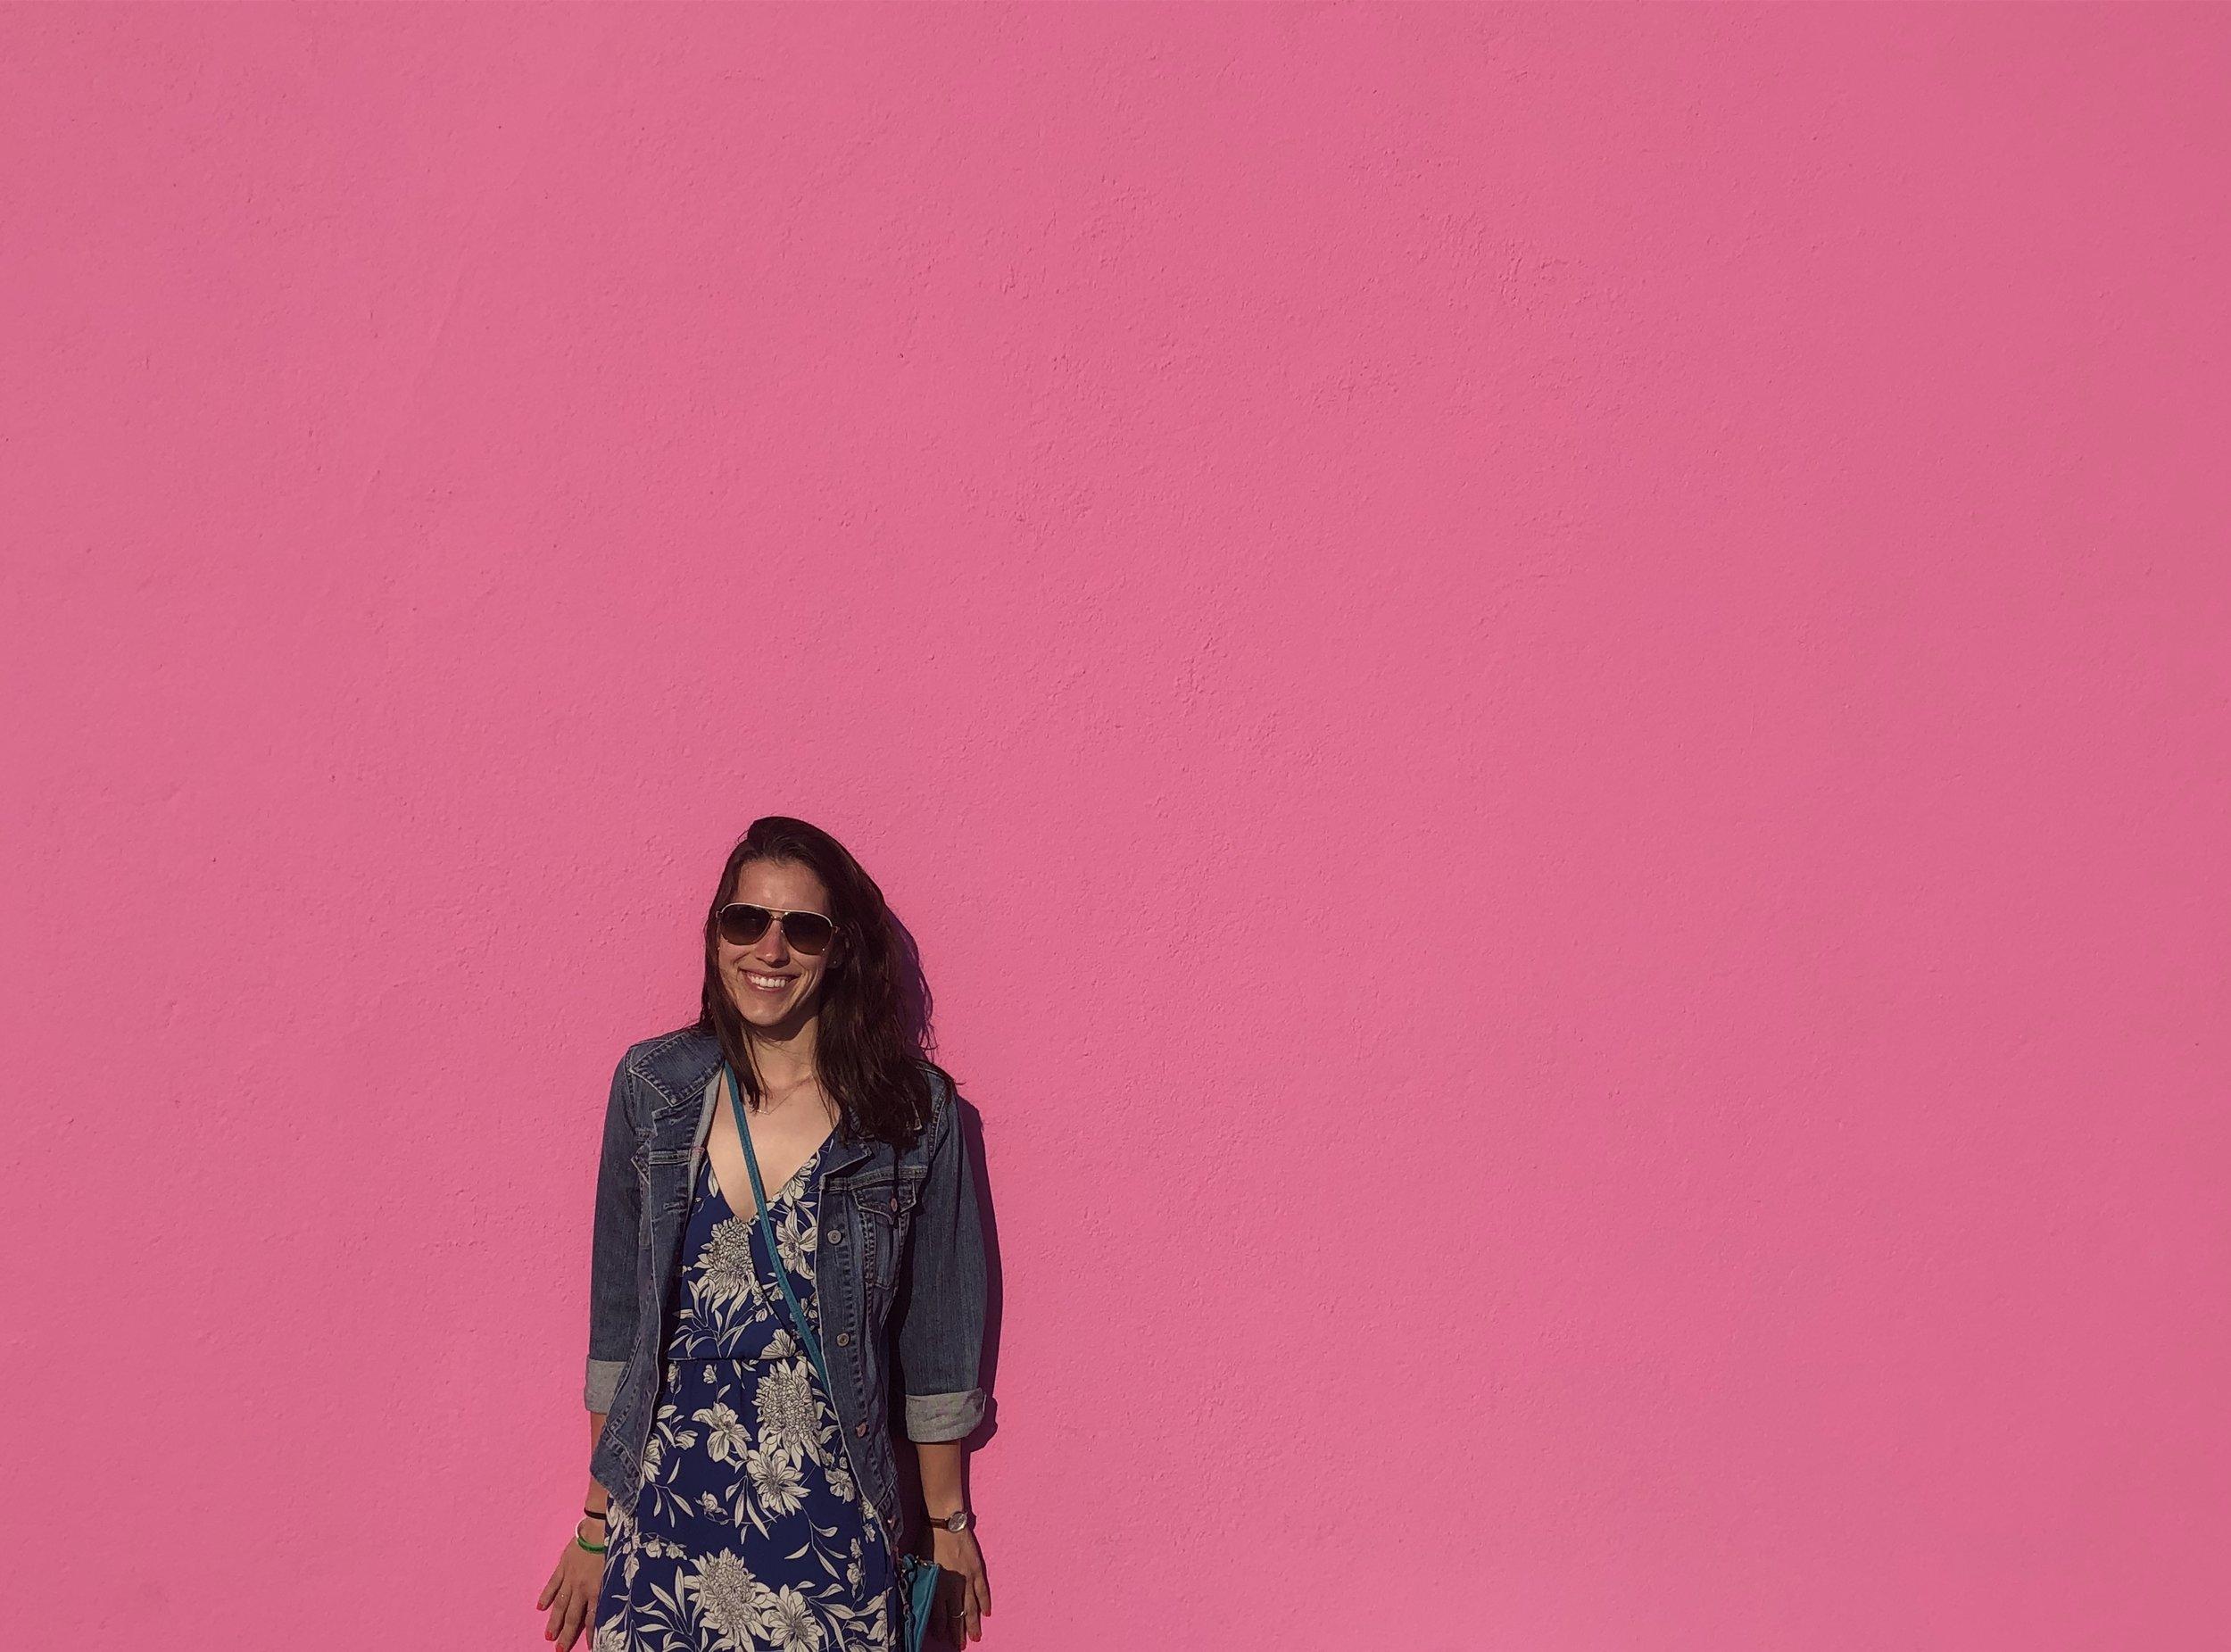 LA Pink wall